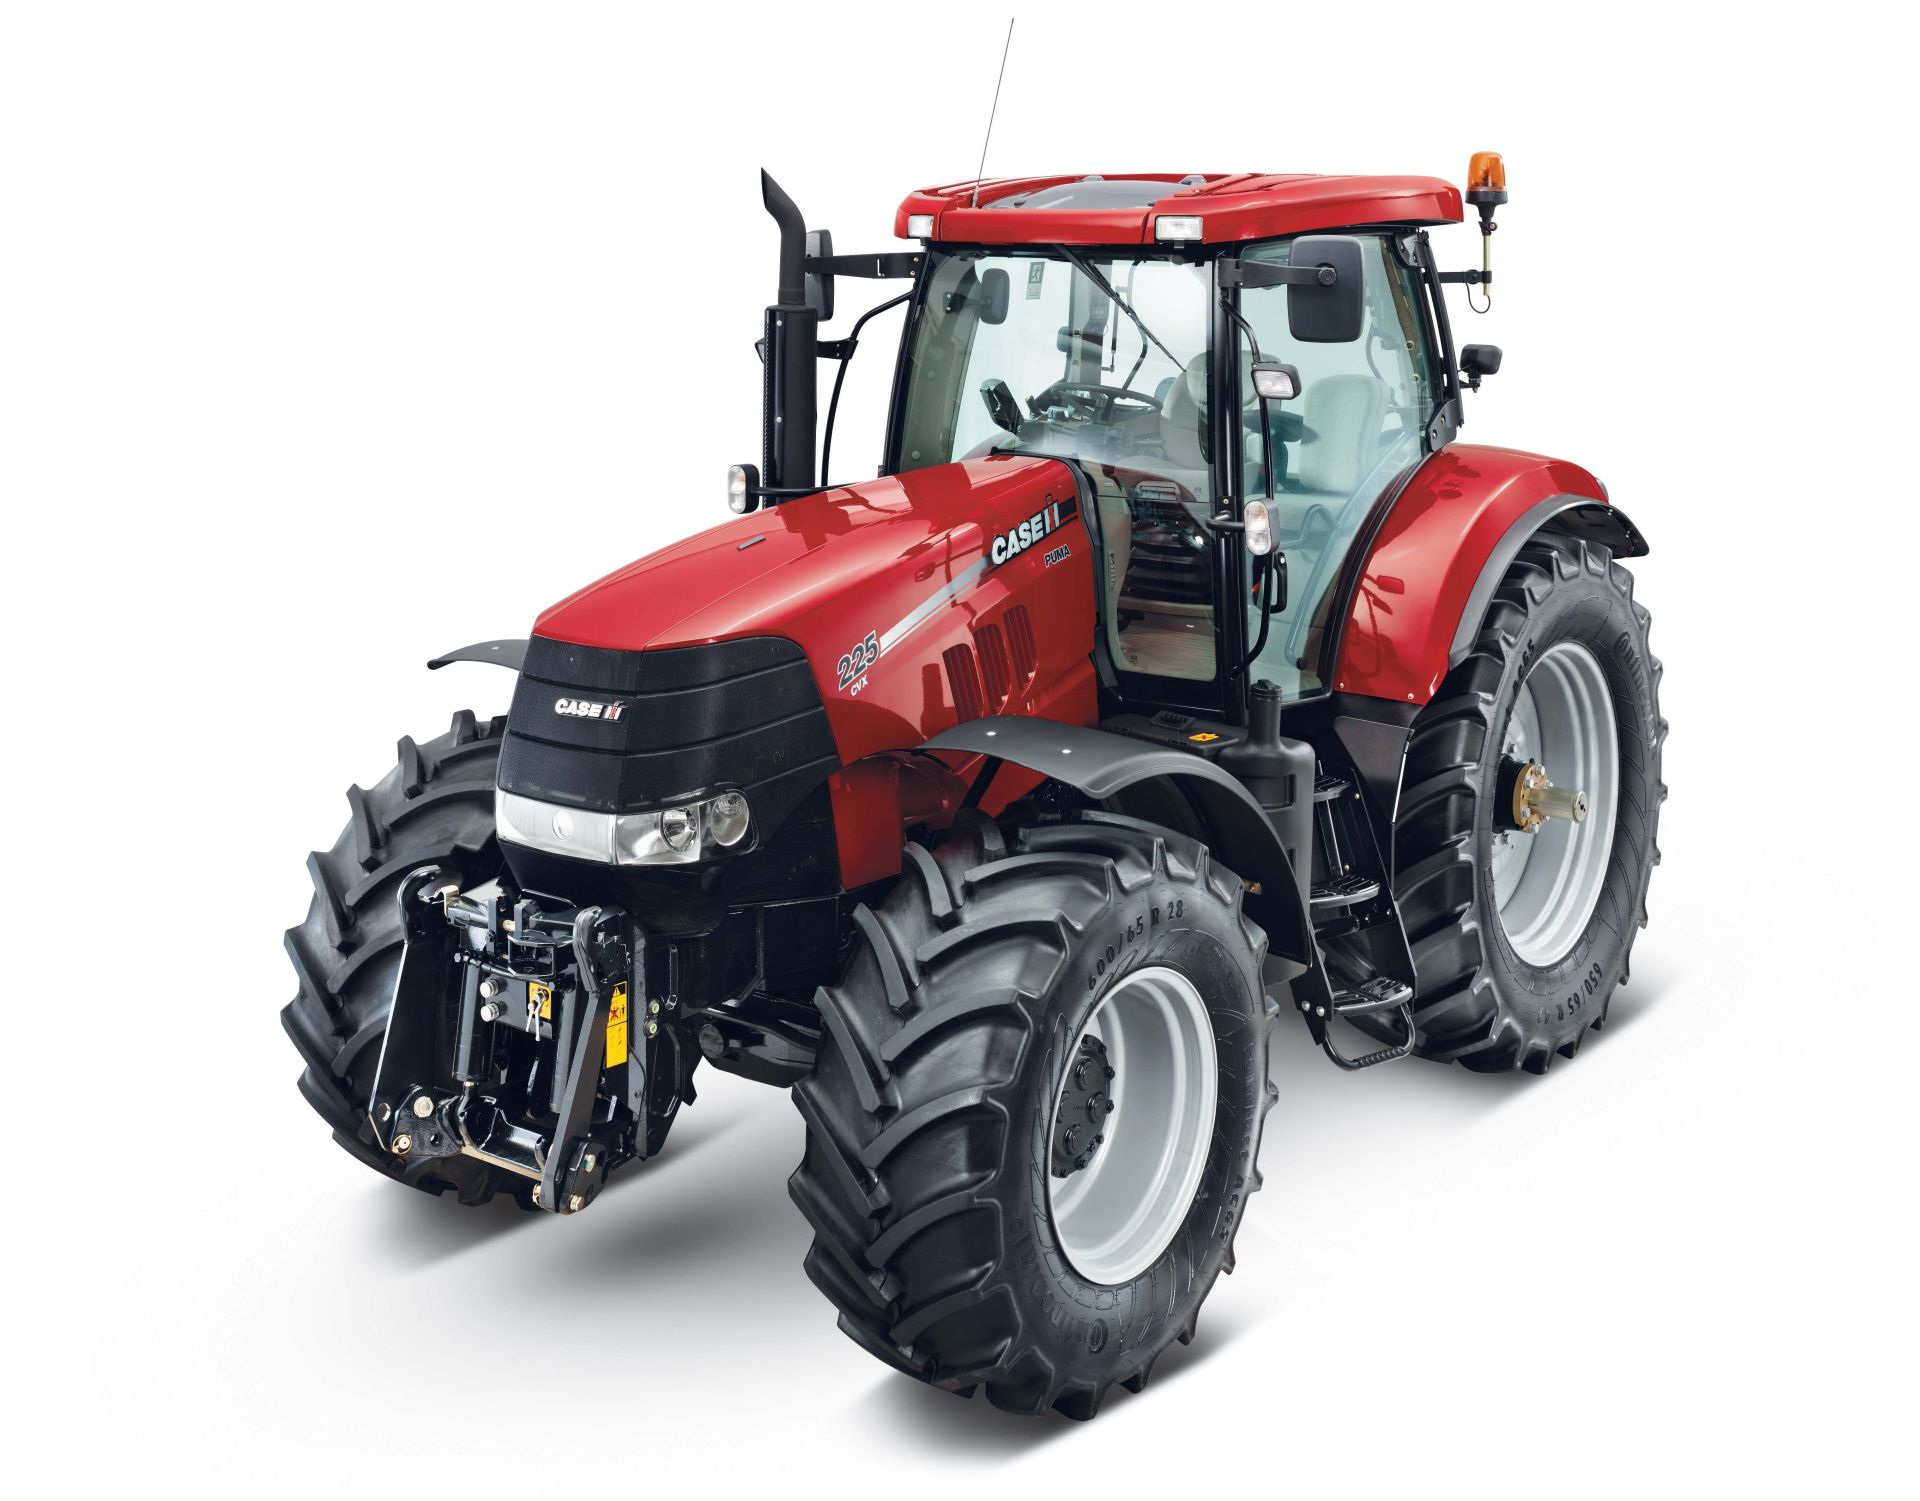 Case Tracked Tractors : Case ih tractor wallpaper wallpapersafari